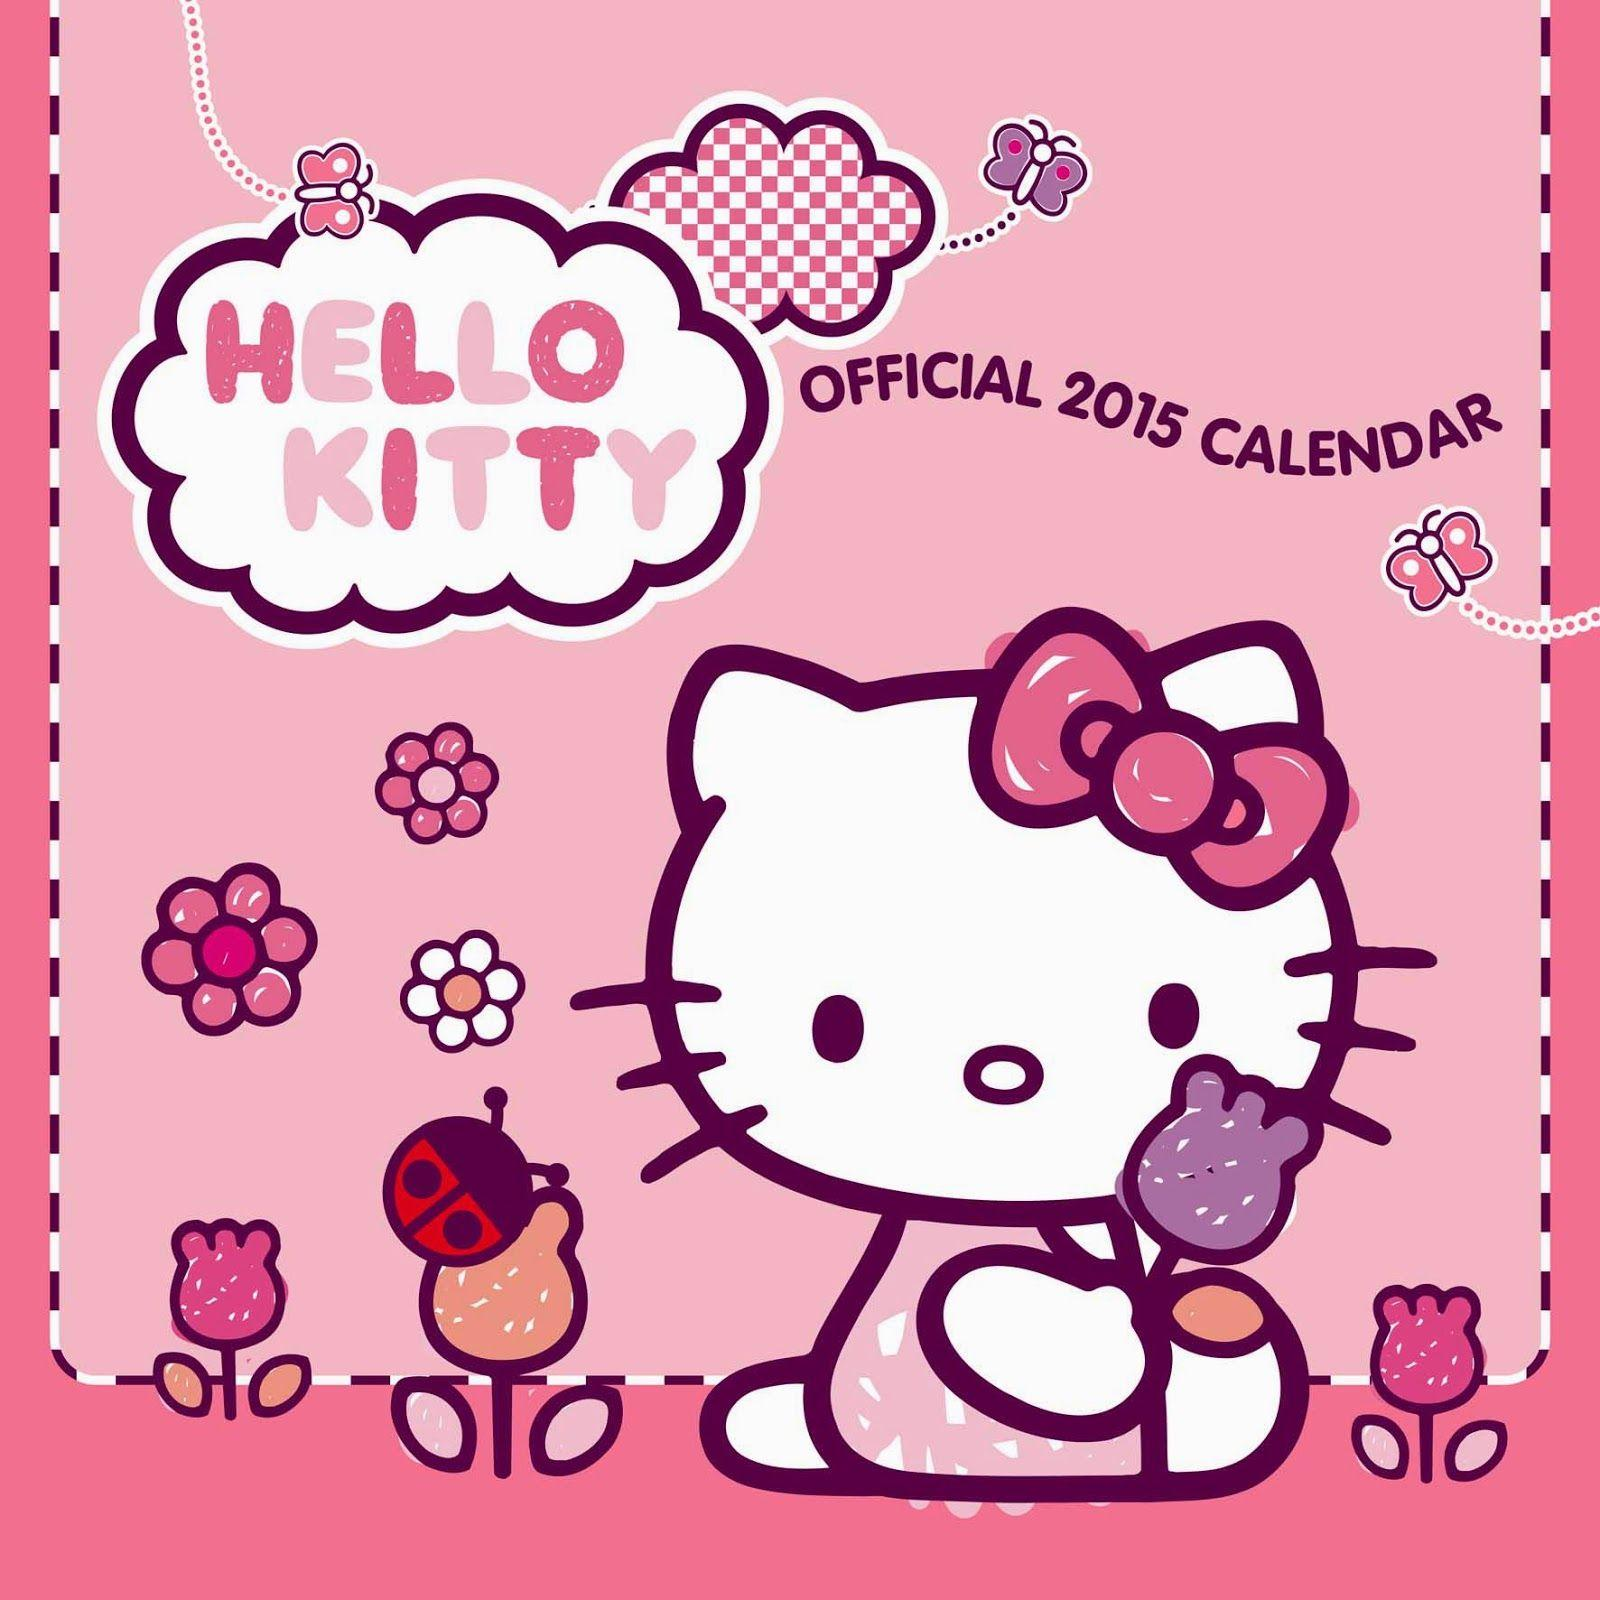 Hello Kitty Pink Cute Wallpaper Bergerak Hello Kitty Wallpapers 2015 Wallpaper Cave